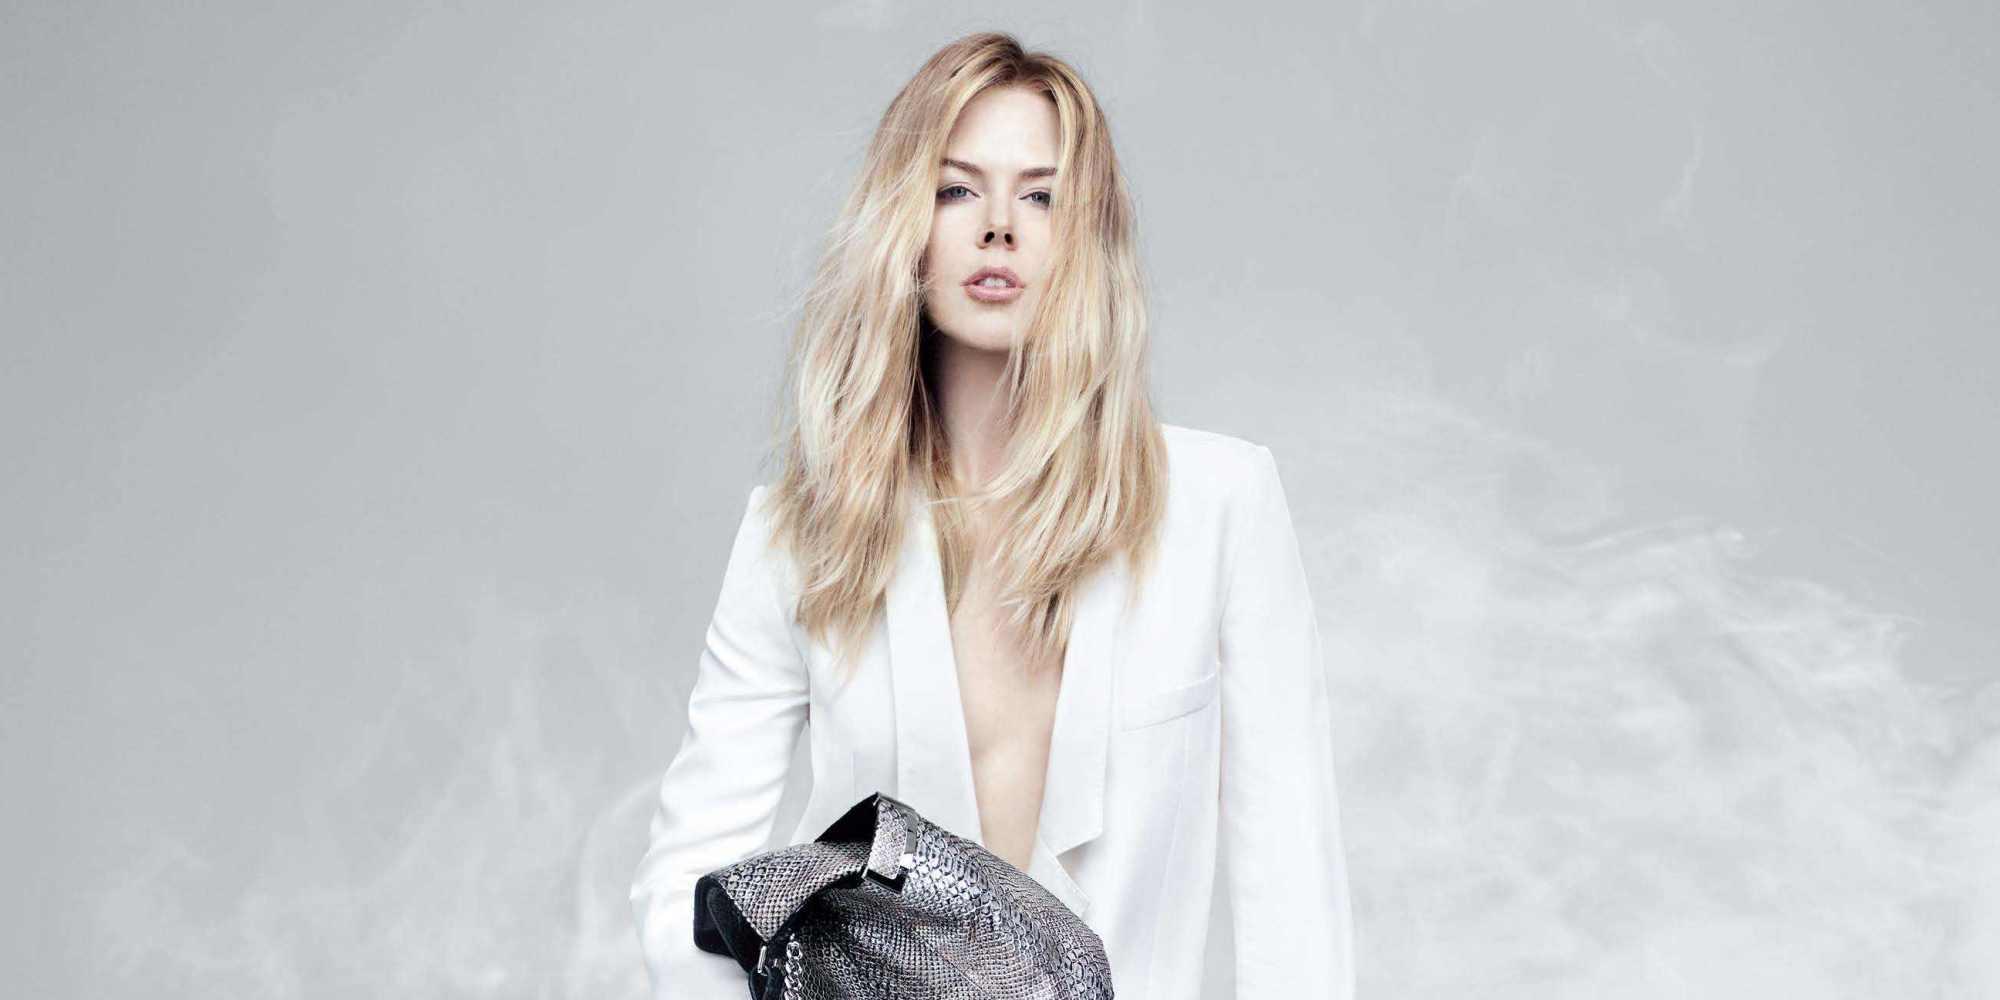 Nicole Kidman Forgoes Pants In New Jimmy Choo Ad